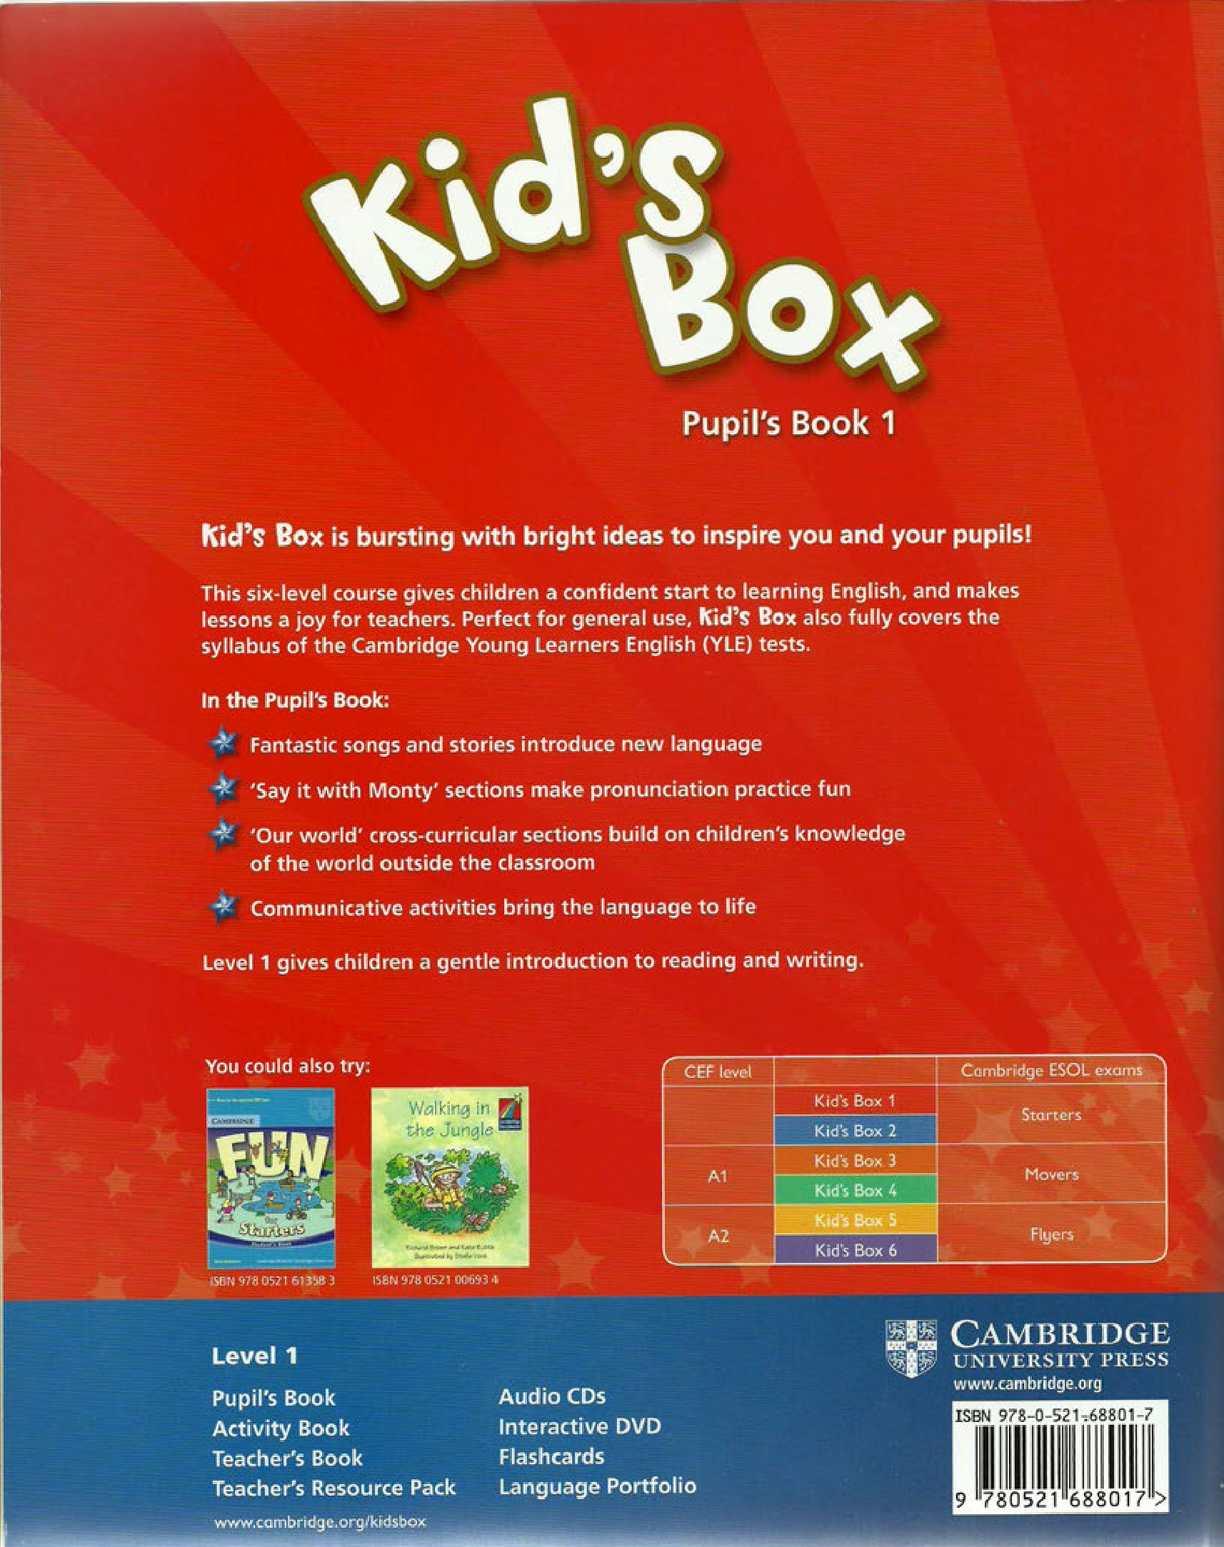 141023253 KIDS BOX 1 PUPILS BOOK Pdf - CALAMEO Downloader